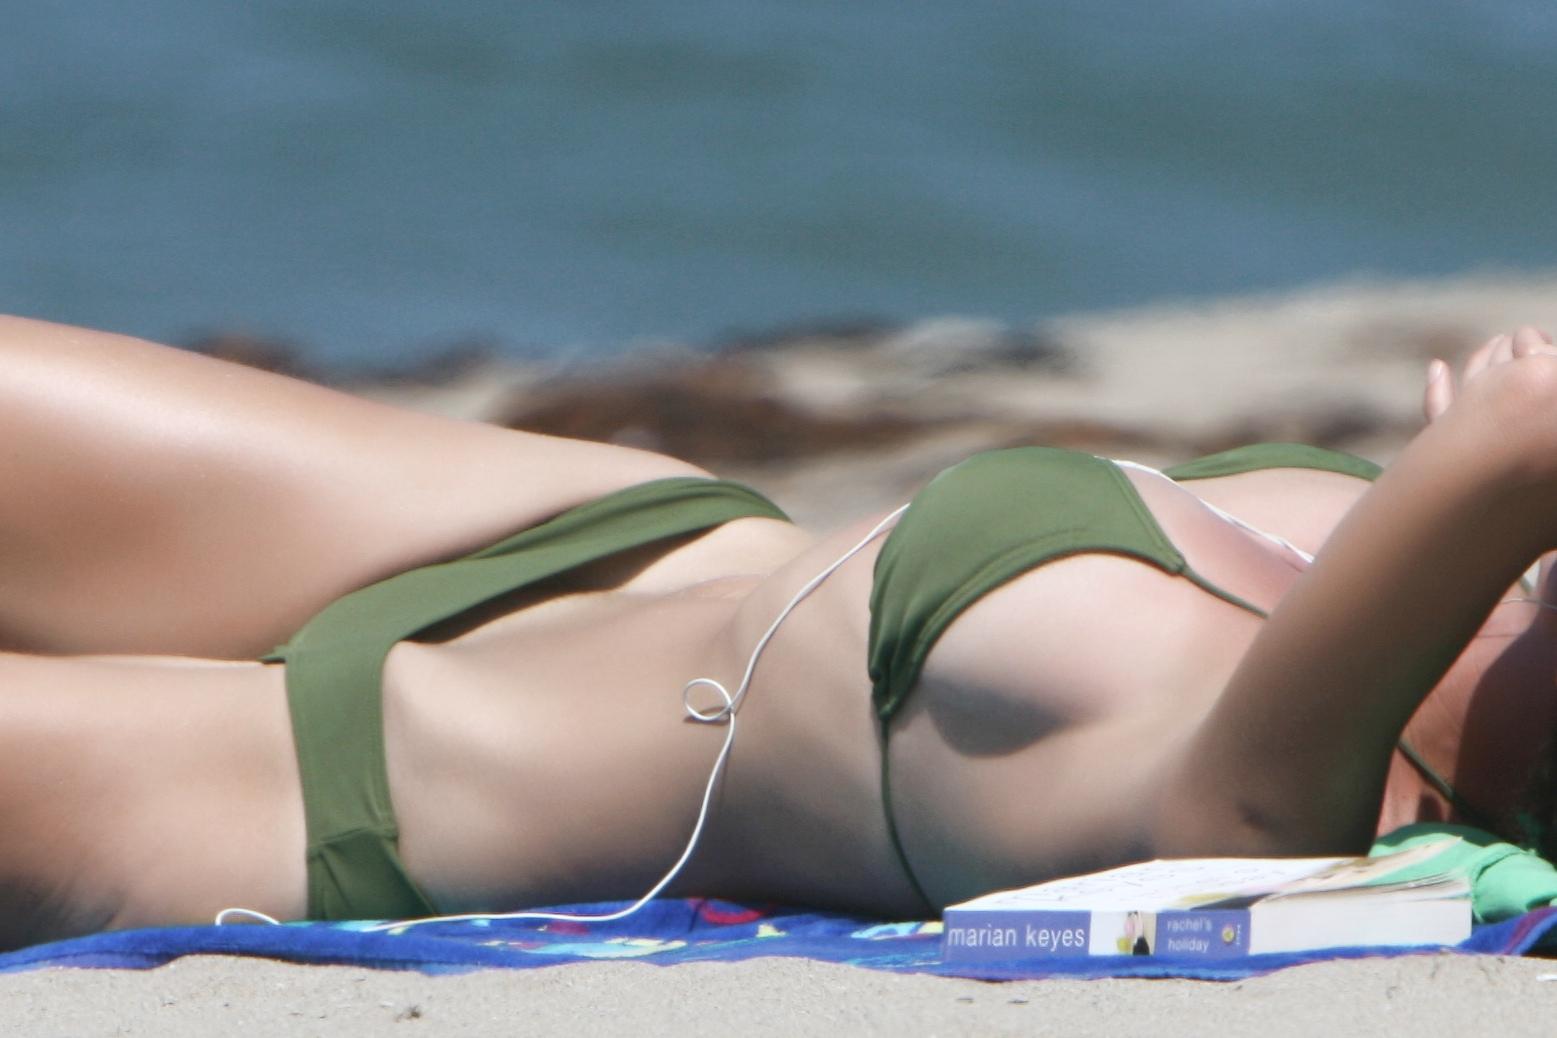 Girl photo bikini oops — photo 3